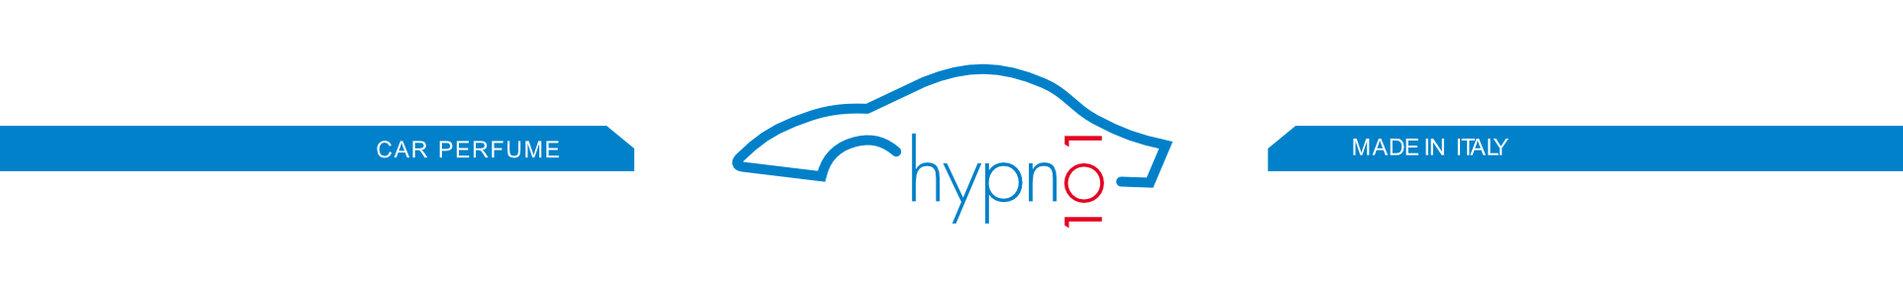 HYPNO101-Autogeuren